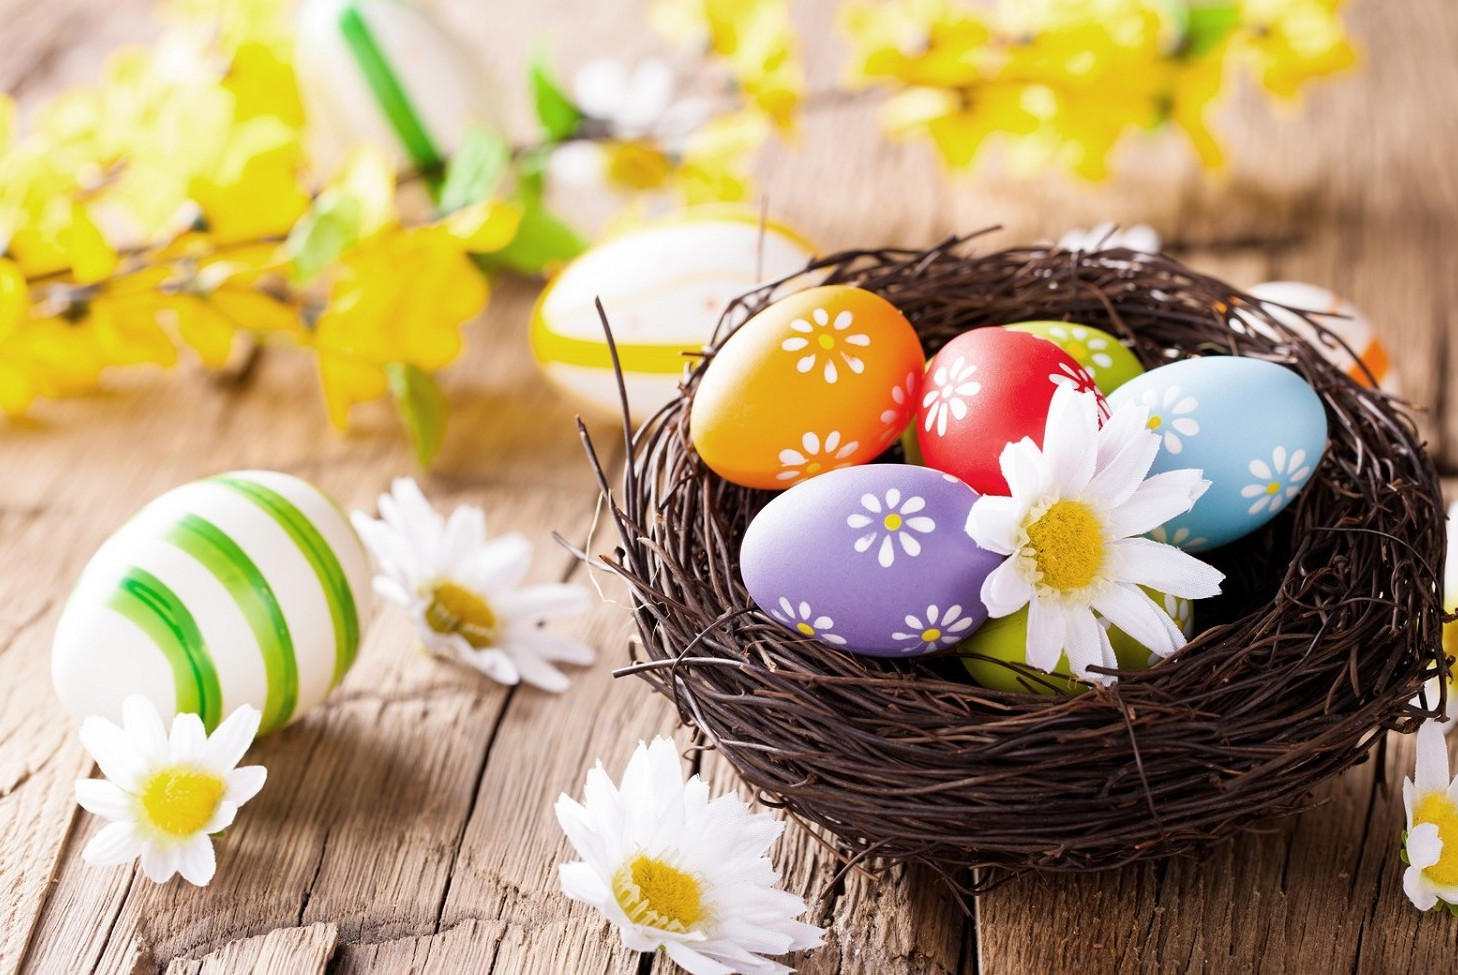 Auguri di Buona Pasqua: 10 frasi special